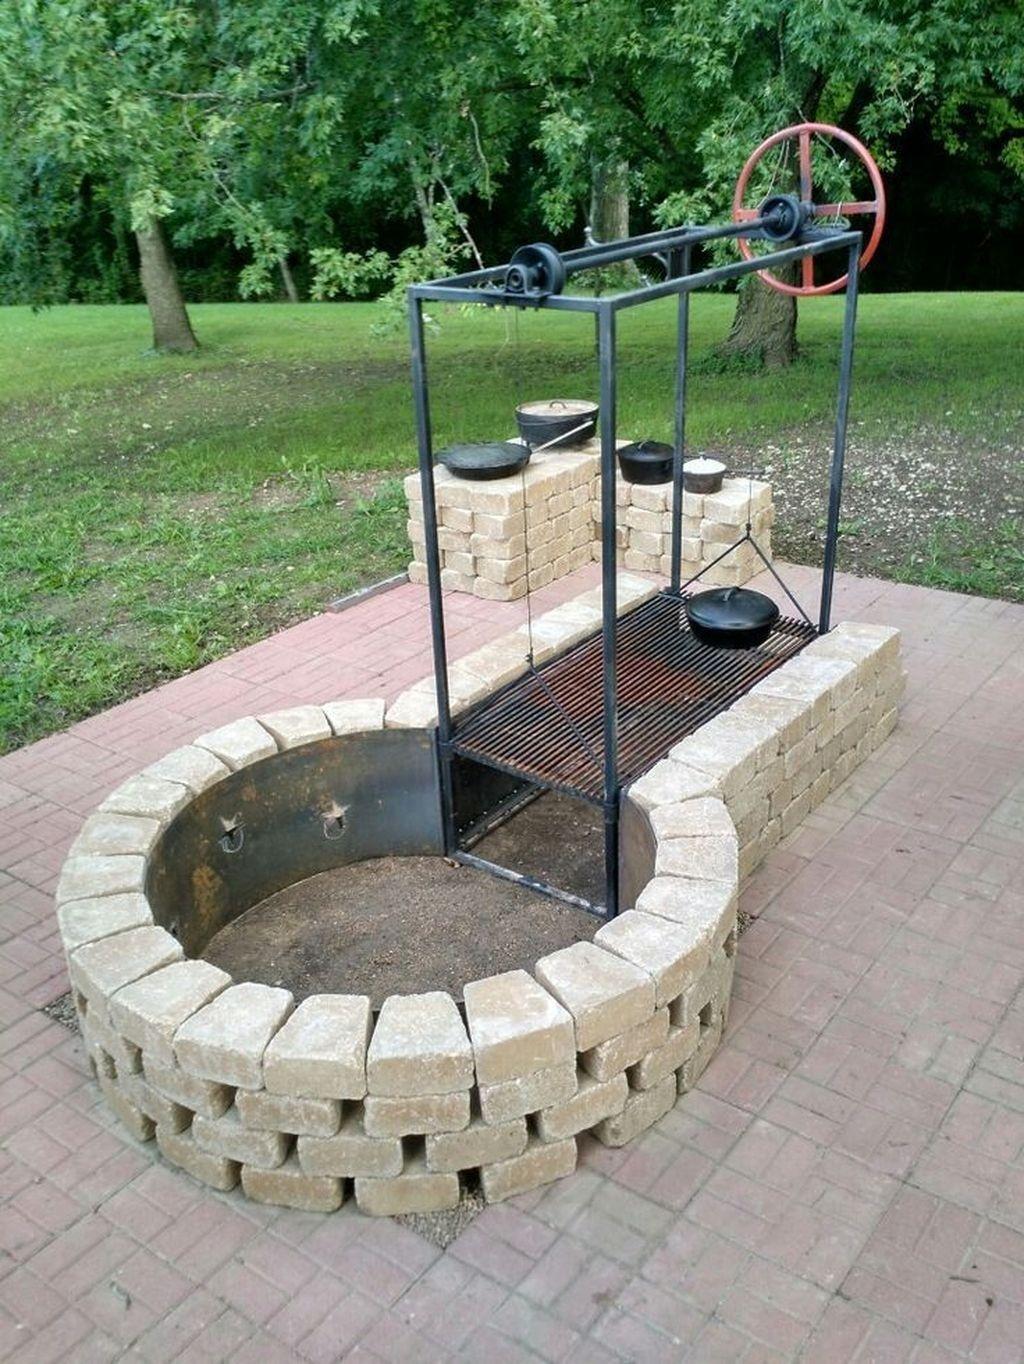 46 Nice Diy Fire Pit Ideas For Bbq Backyard Fire Pit Bbq Fire